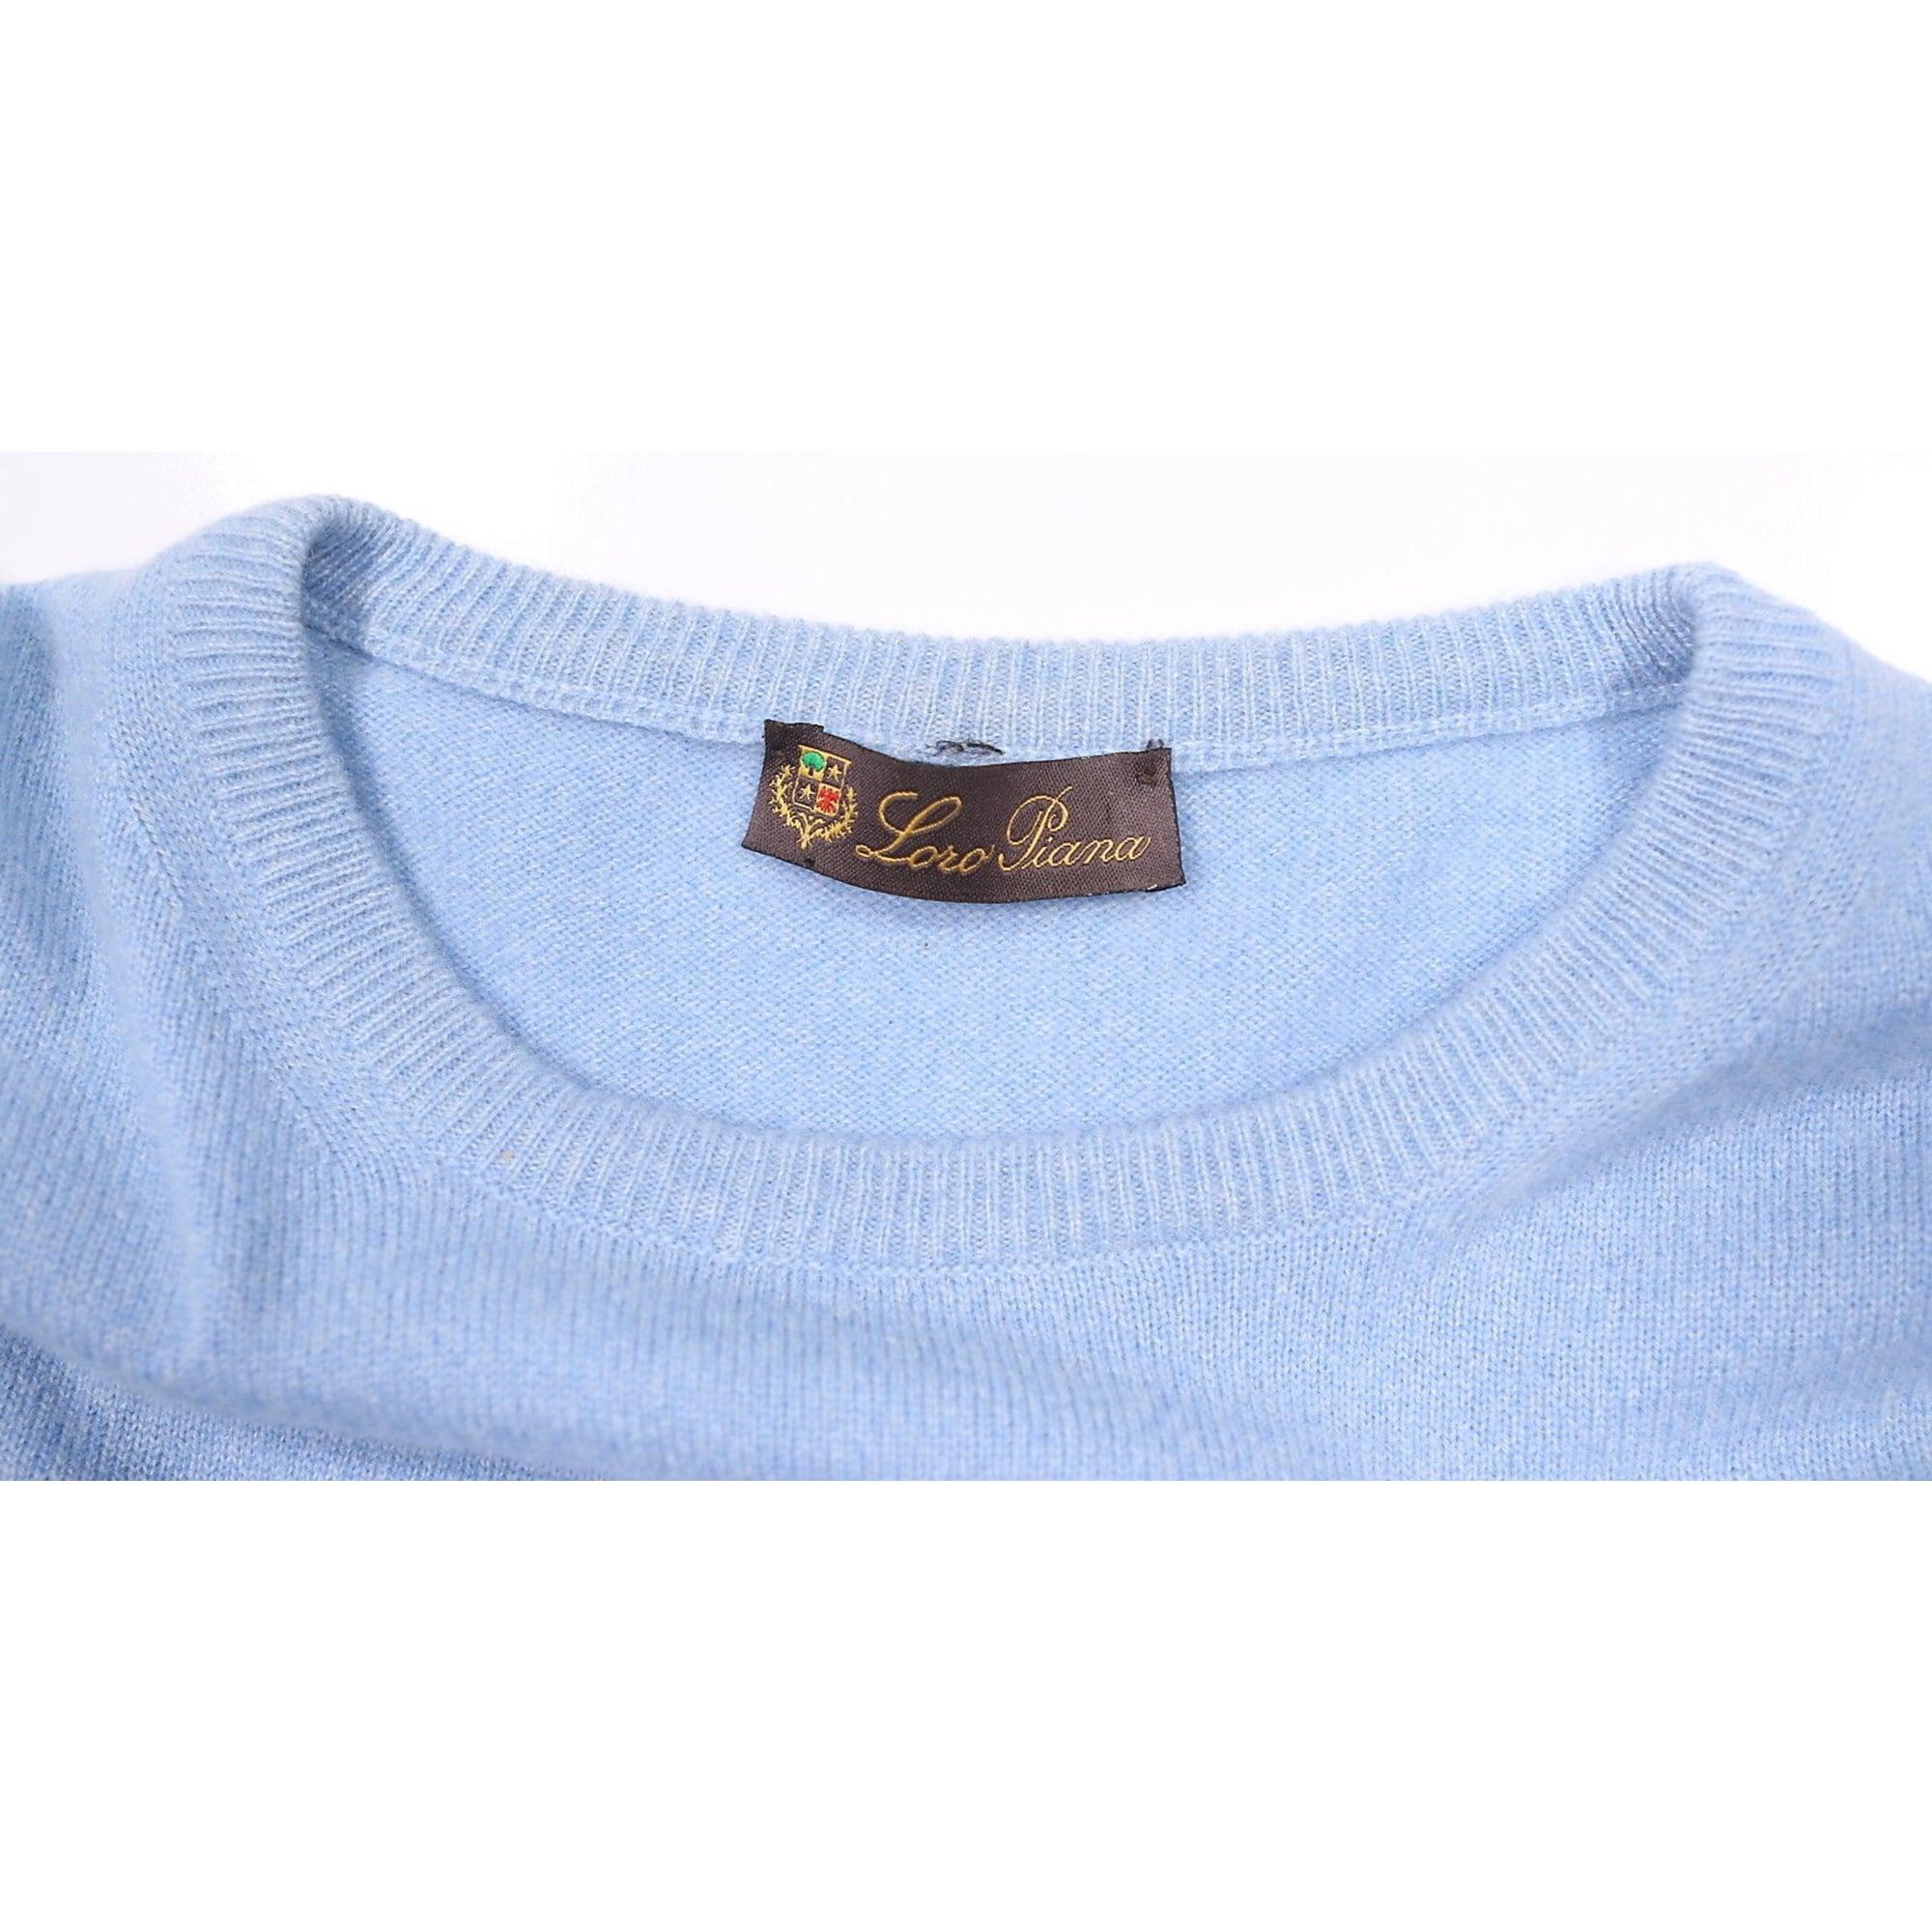 Pull LORO PIANA Bleu, bleu marine, bleu turquoise